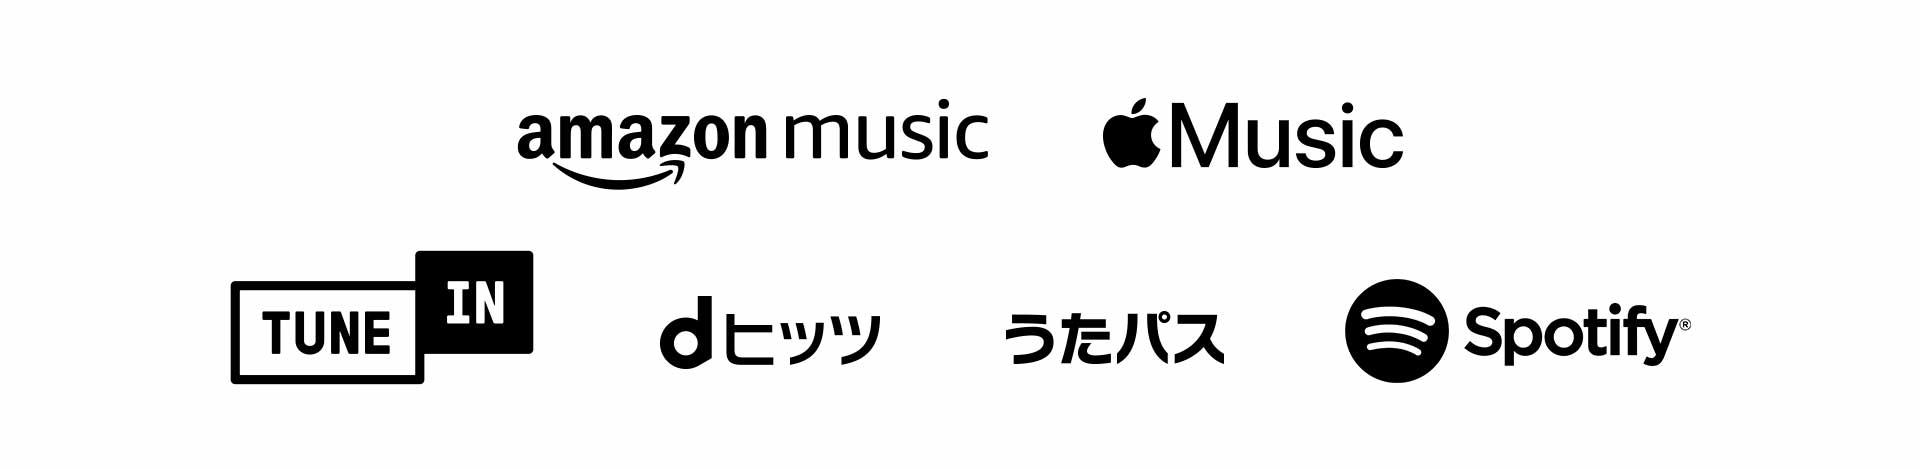 https://m.media-amazon.com/images/G/09/kindle/dp/2019/58537243_9/shared/shared_music_logos._CB452666977_.jpg